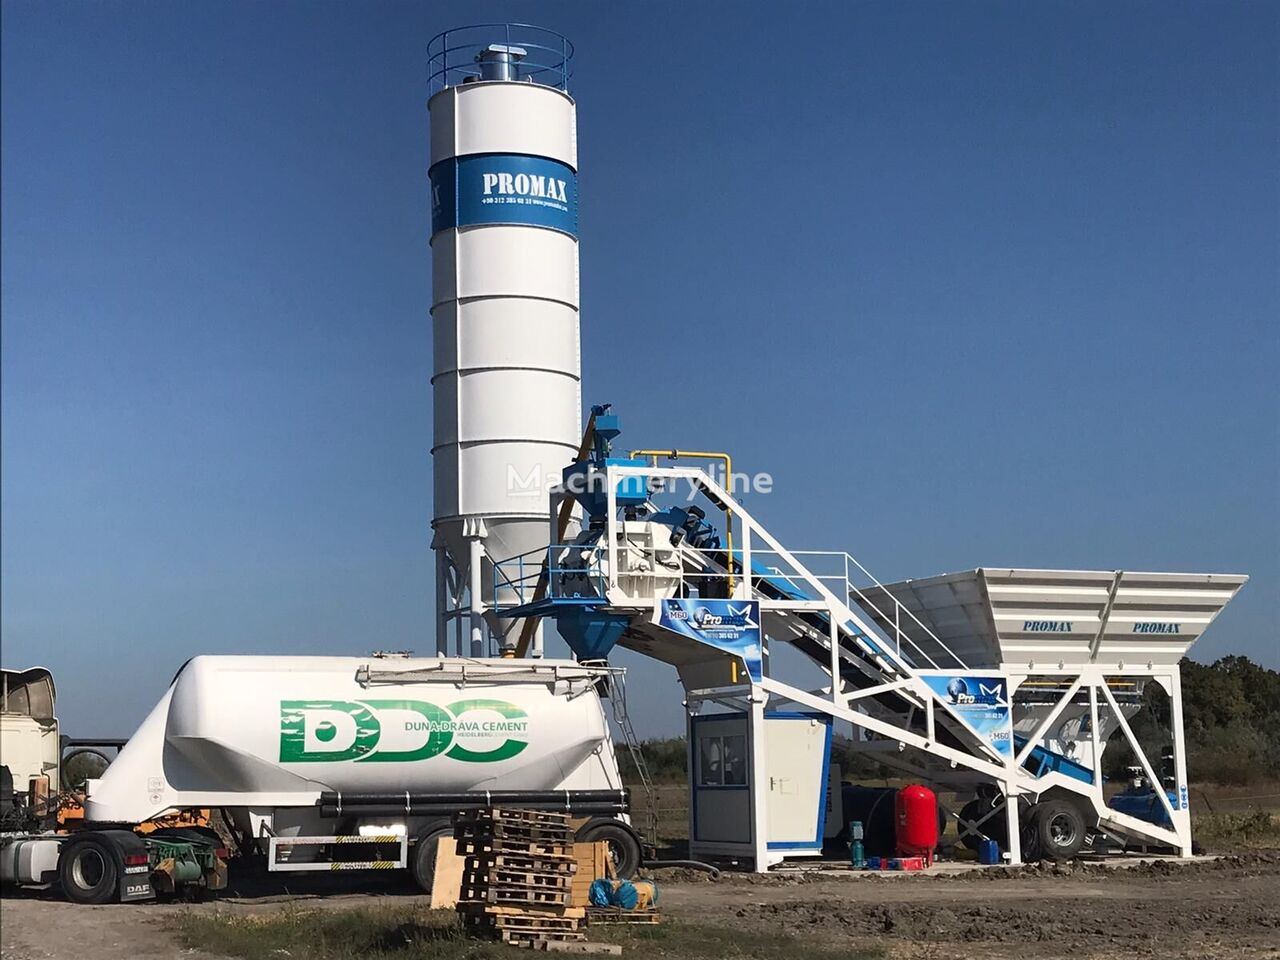 central de betão PROMAX Mobile Concrete Batching Plant PROMAX M60-SNG (60m3/h) novo